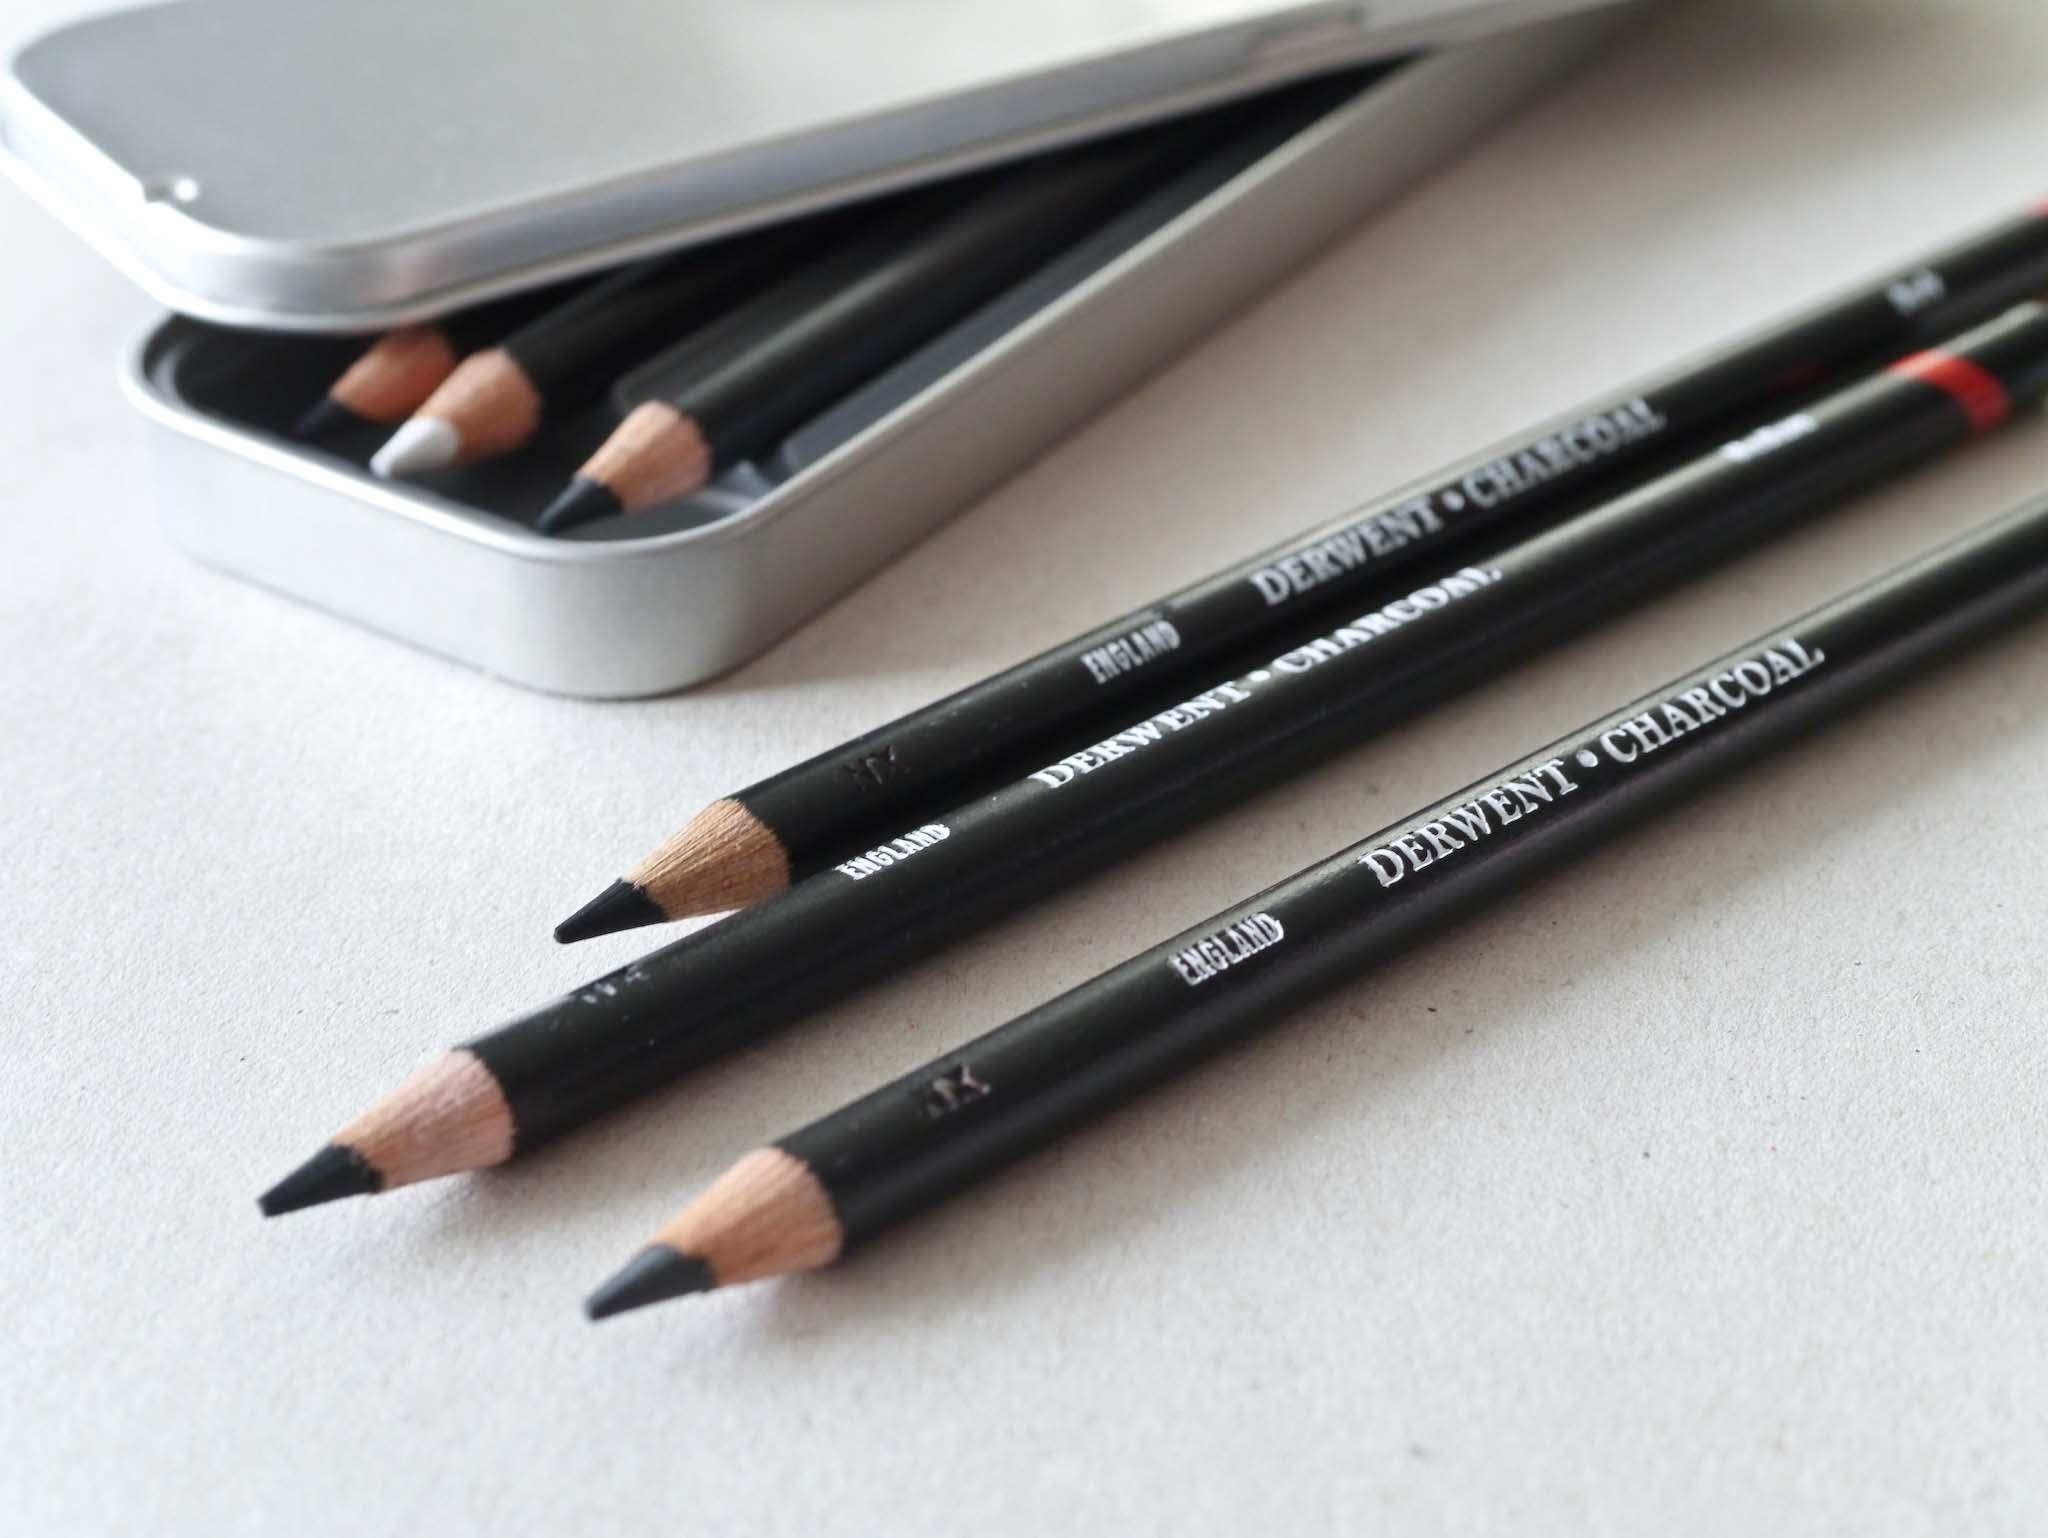 Derwent Charcoal Pencils